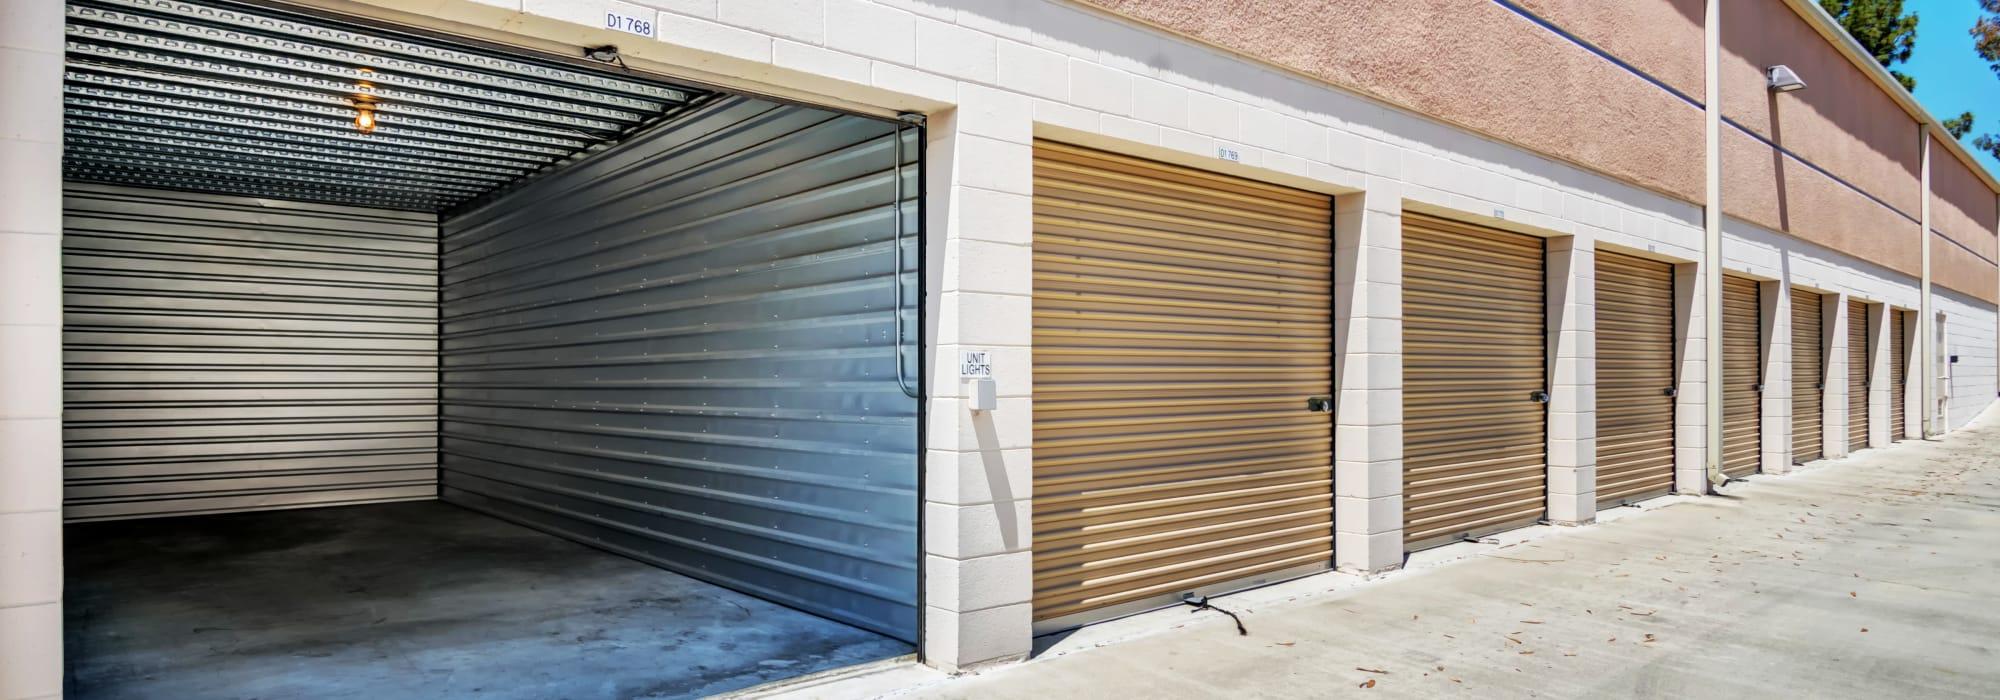 Outdoor units at Smart Self Storage of Eastlake in Chula Vista, California